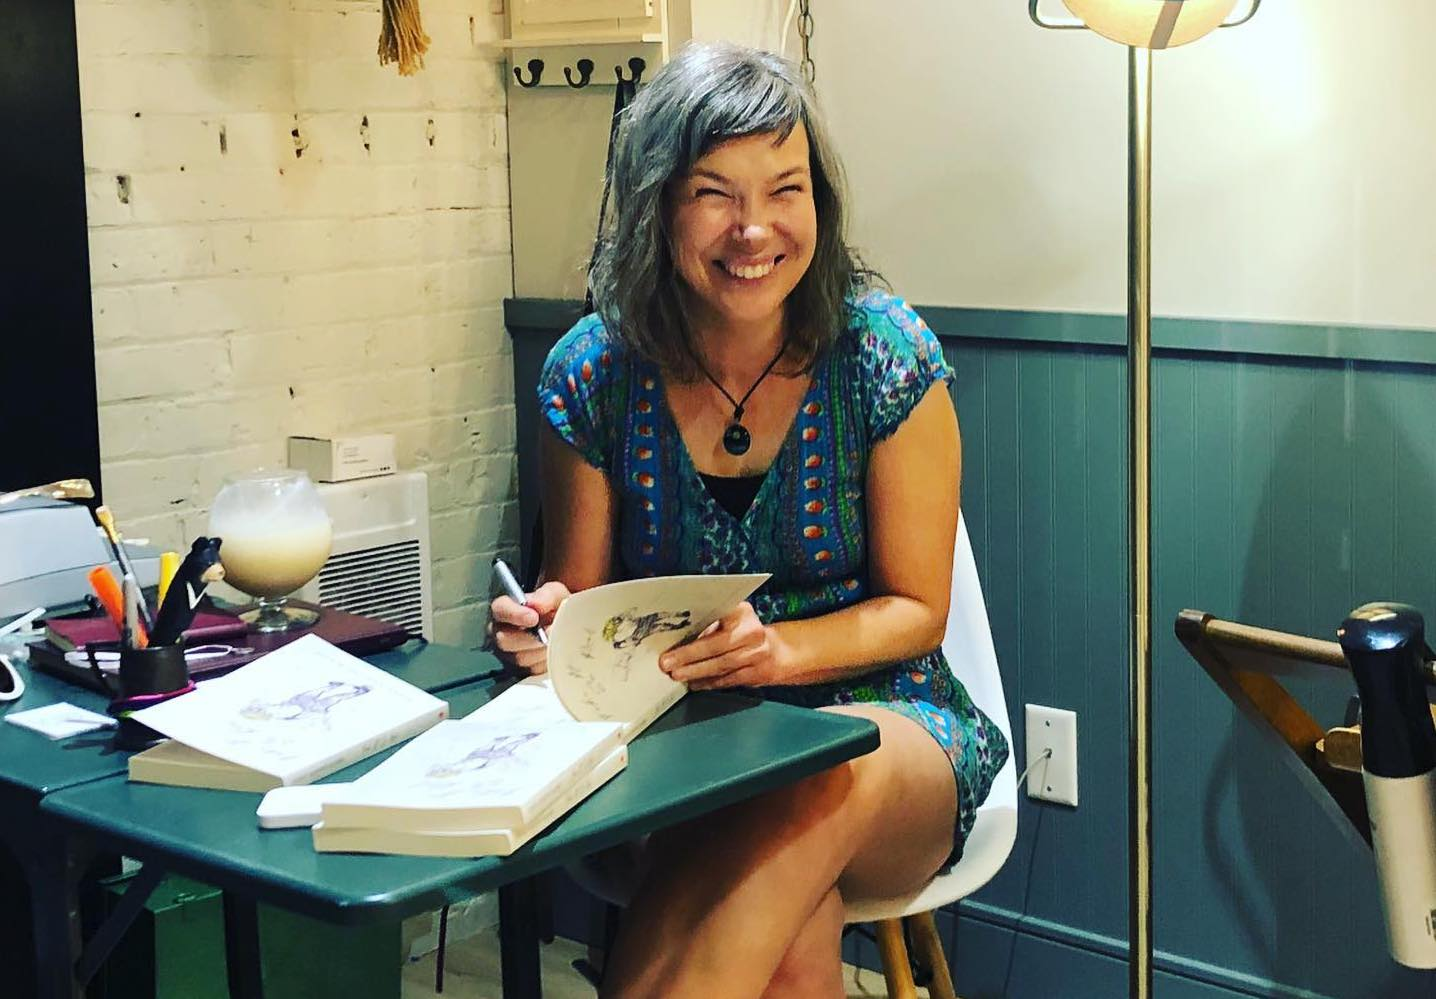 Victoria-based Susan Sanford Blades's debut novel, Fake It So Real, earns awards and nominations